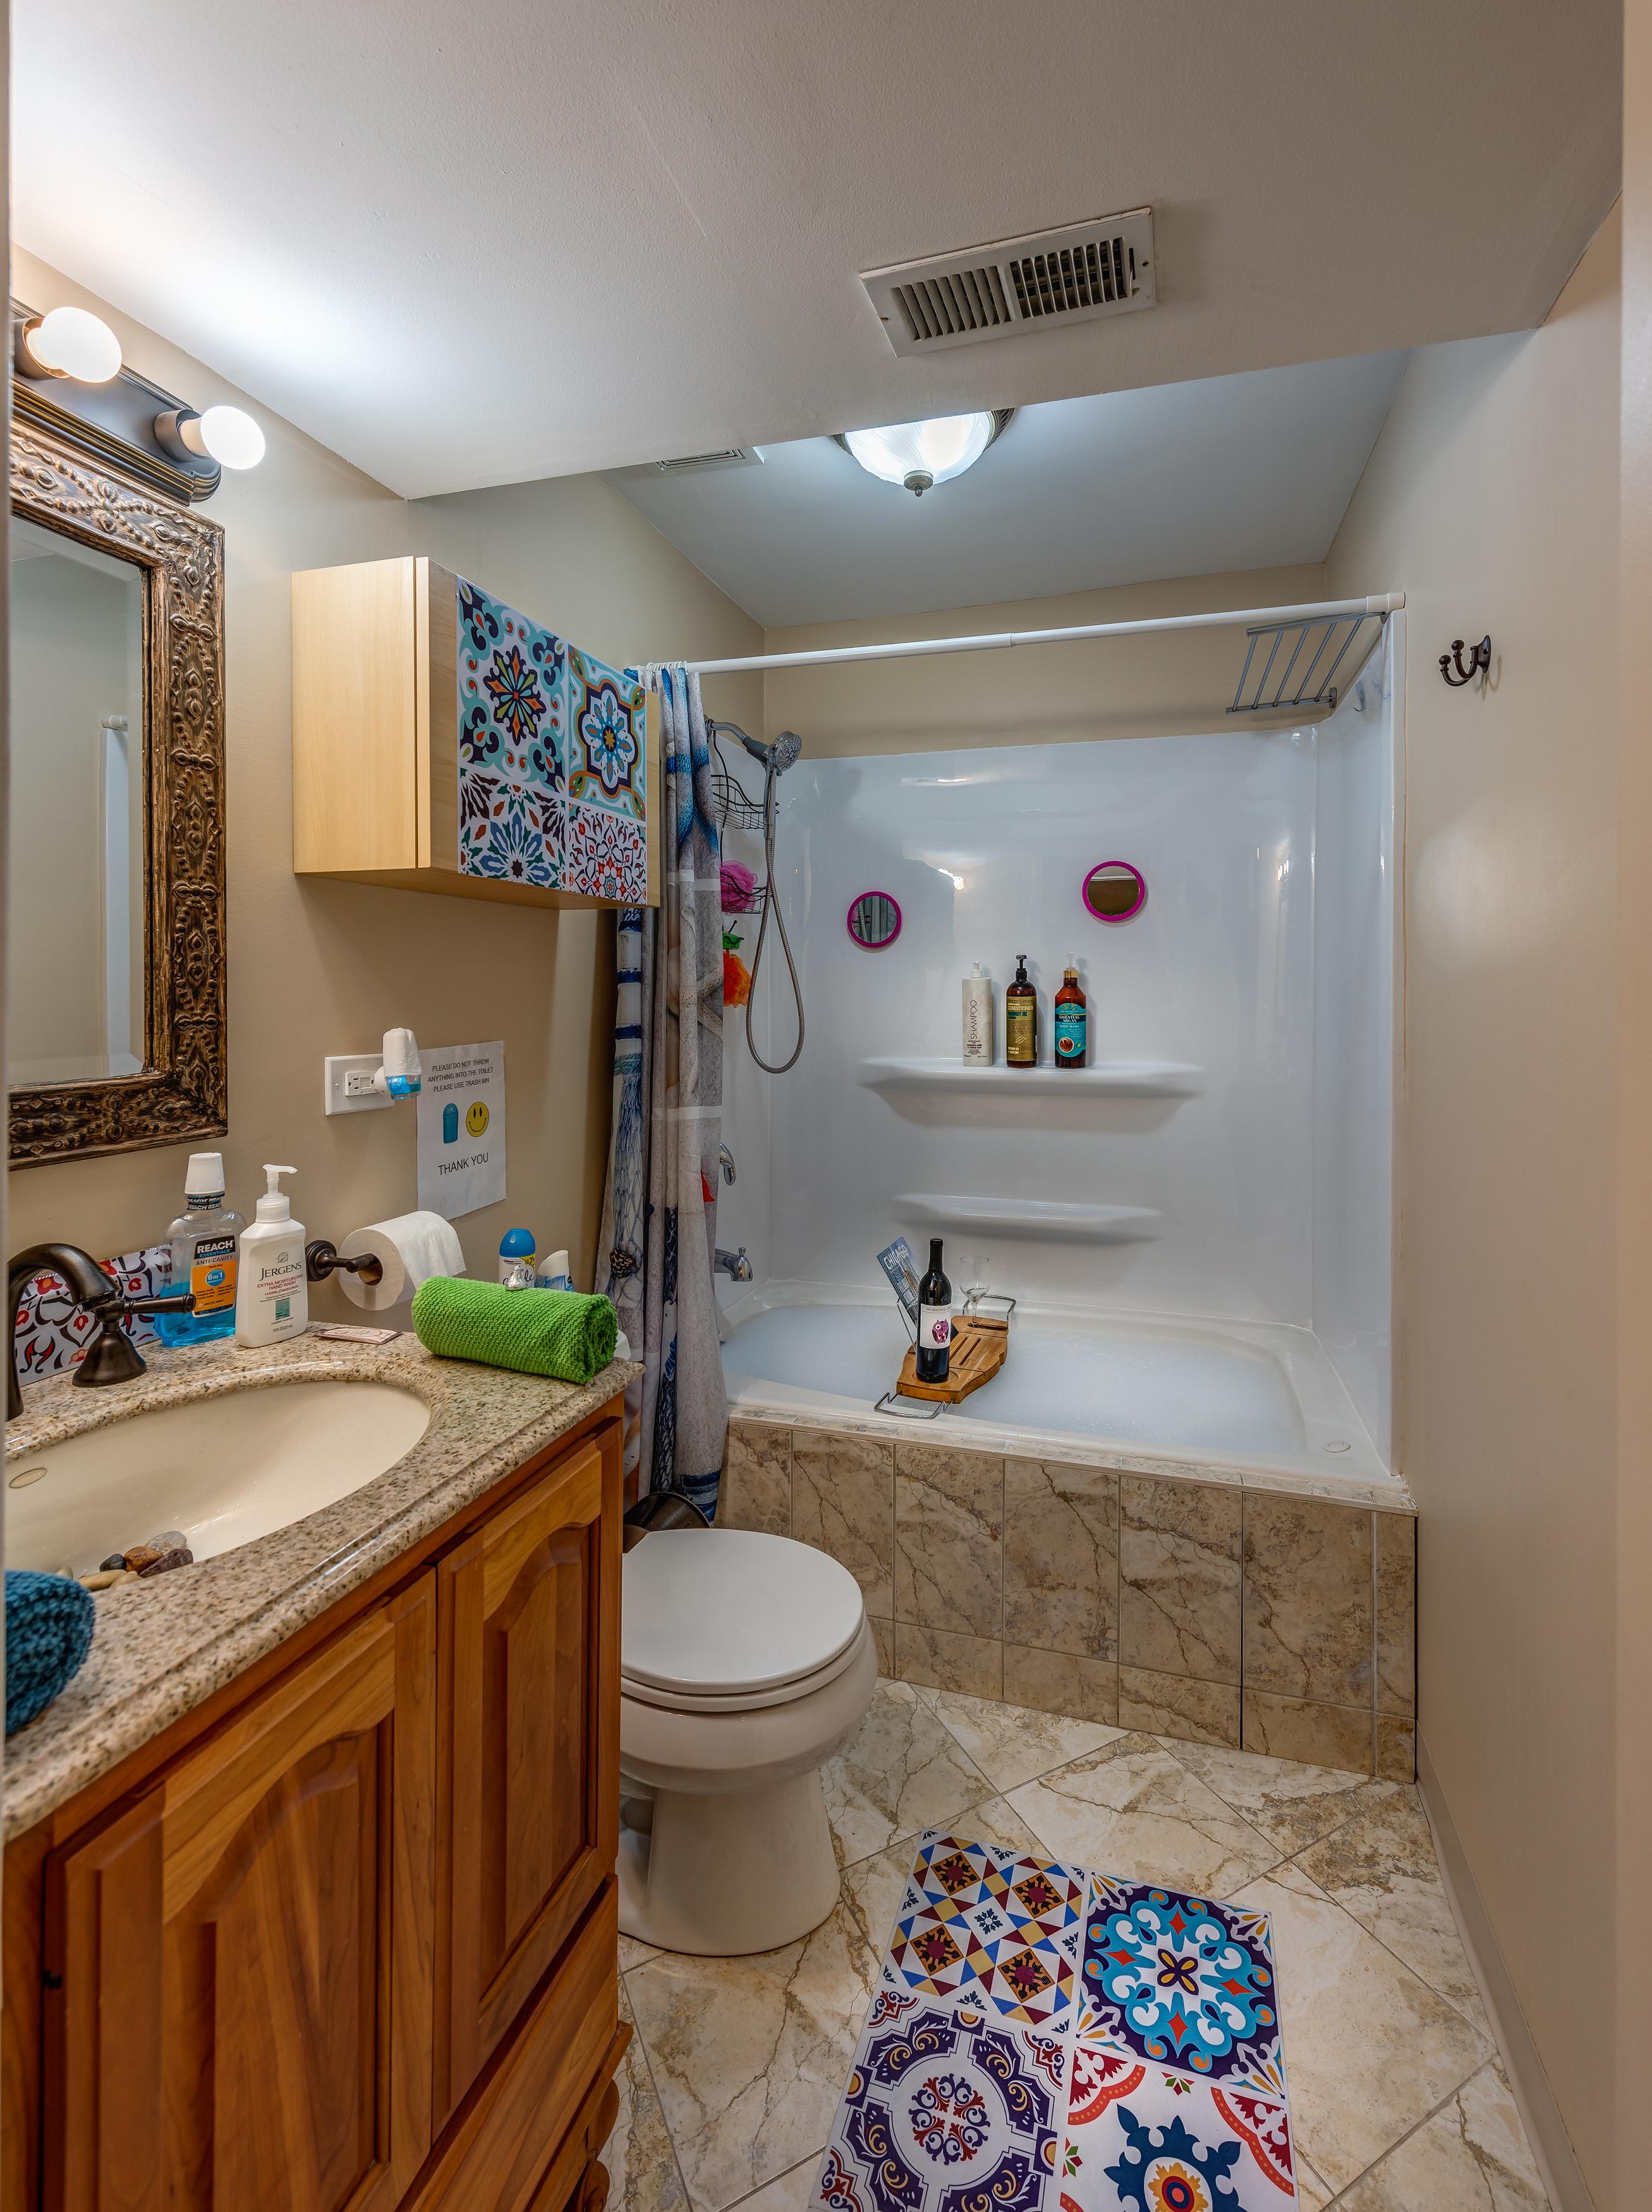 D-K-GNFamily Friendly Apartment near University. photo 23582661